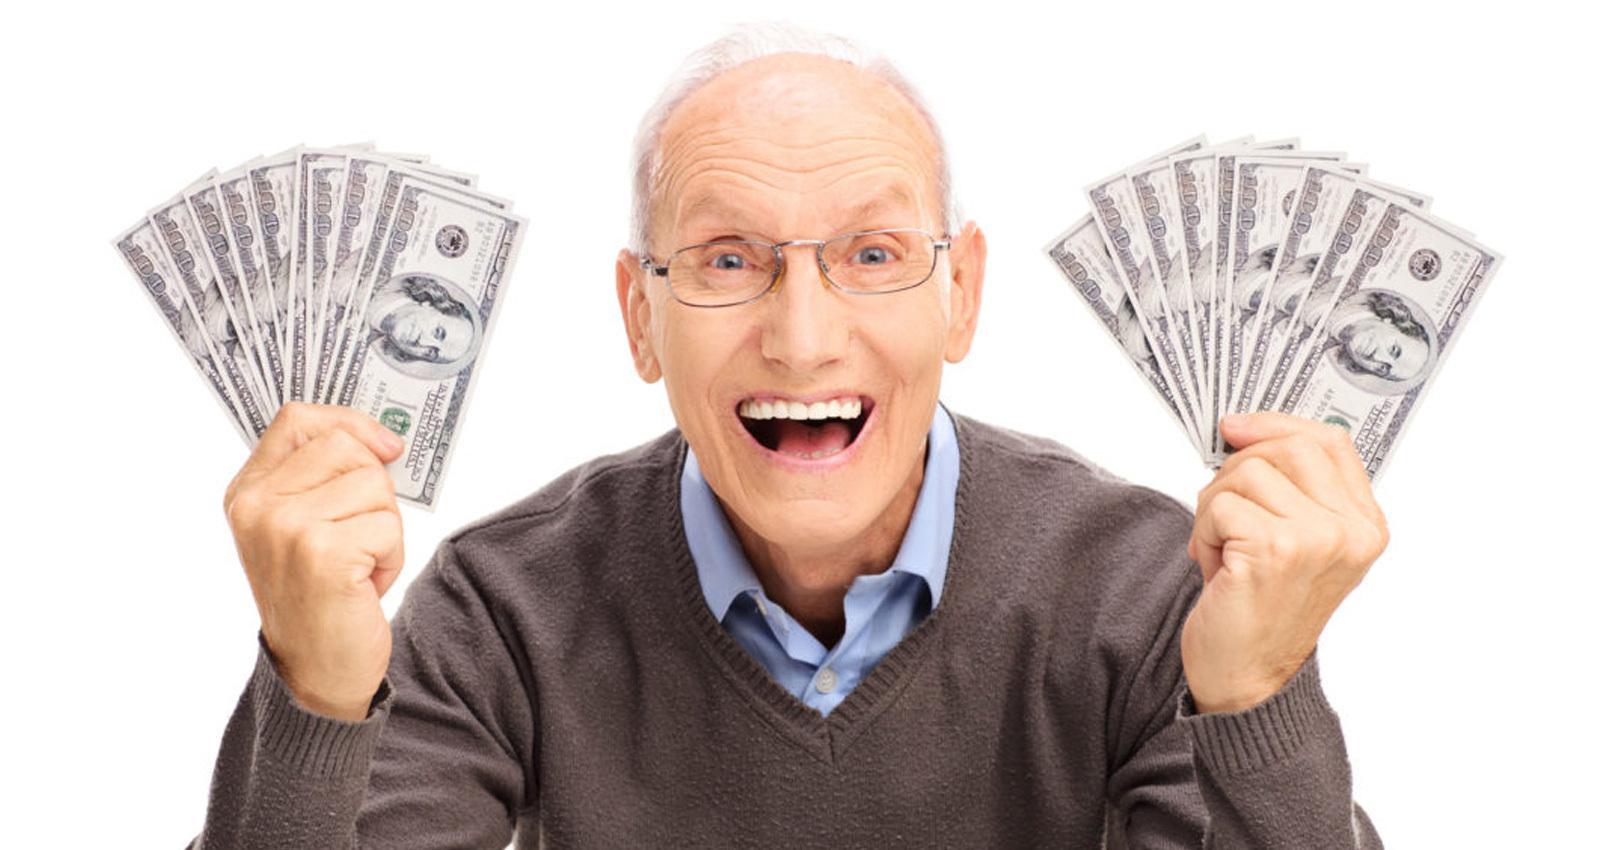 Lotería: hombre gana millones de dólares con boleto equivocado.